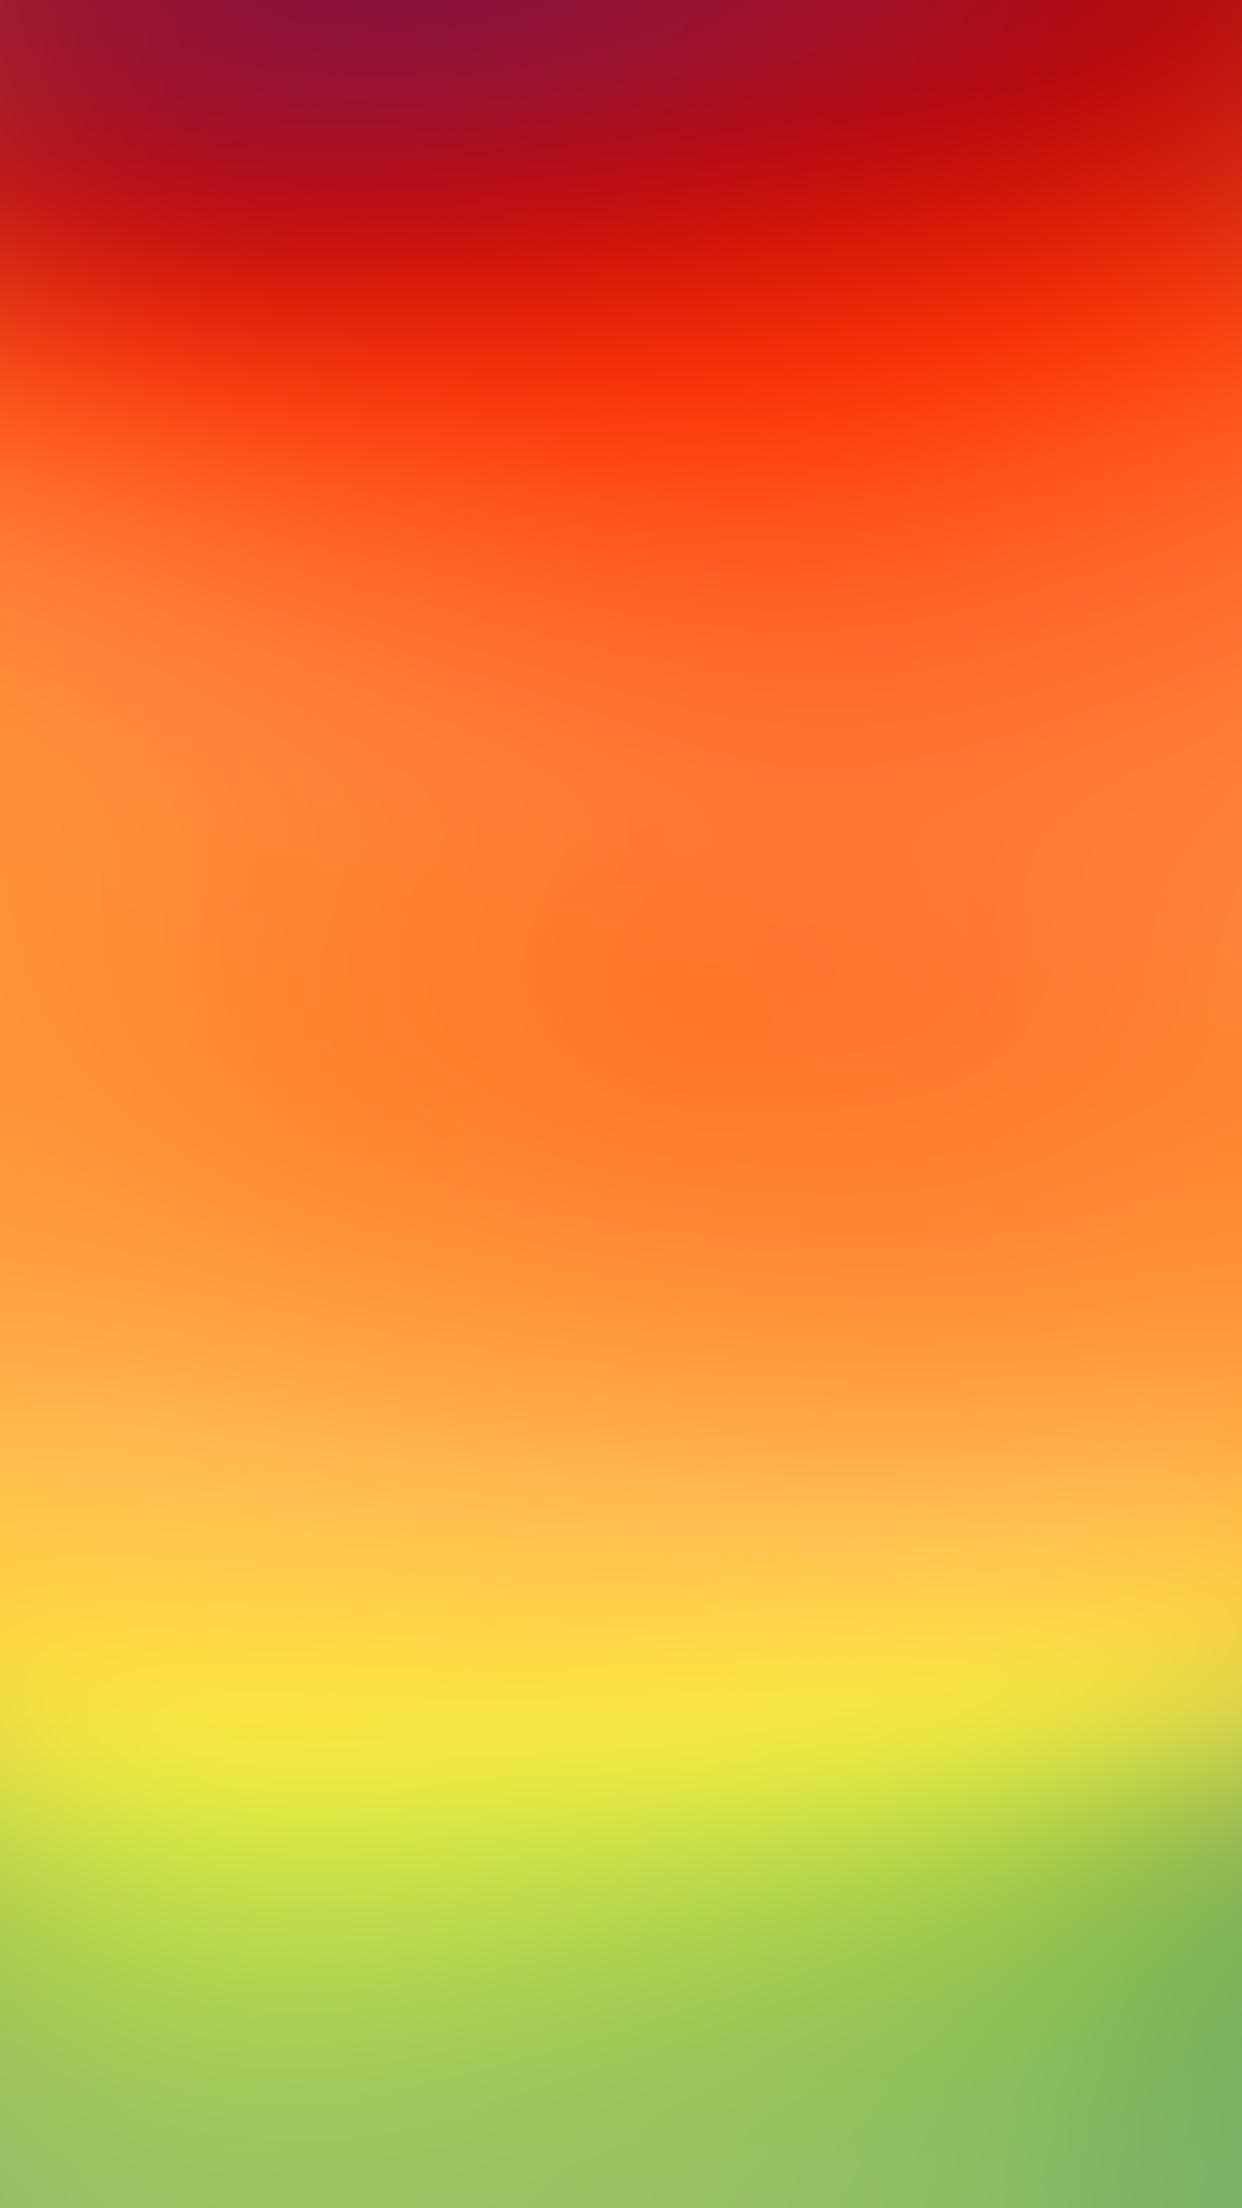 papers.co sk55 fantastic red orange blur gradation 34 iphone6 plus wallpaper